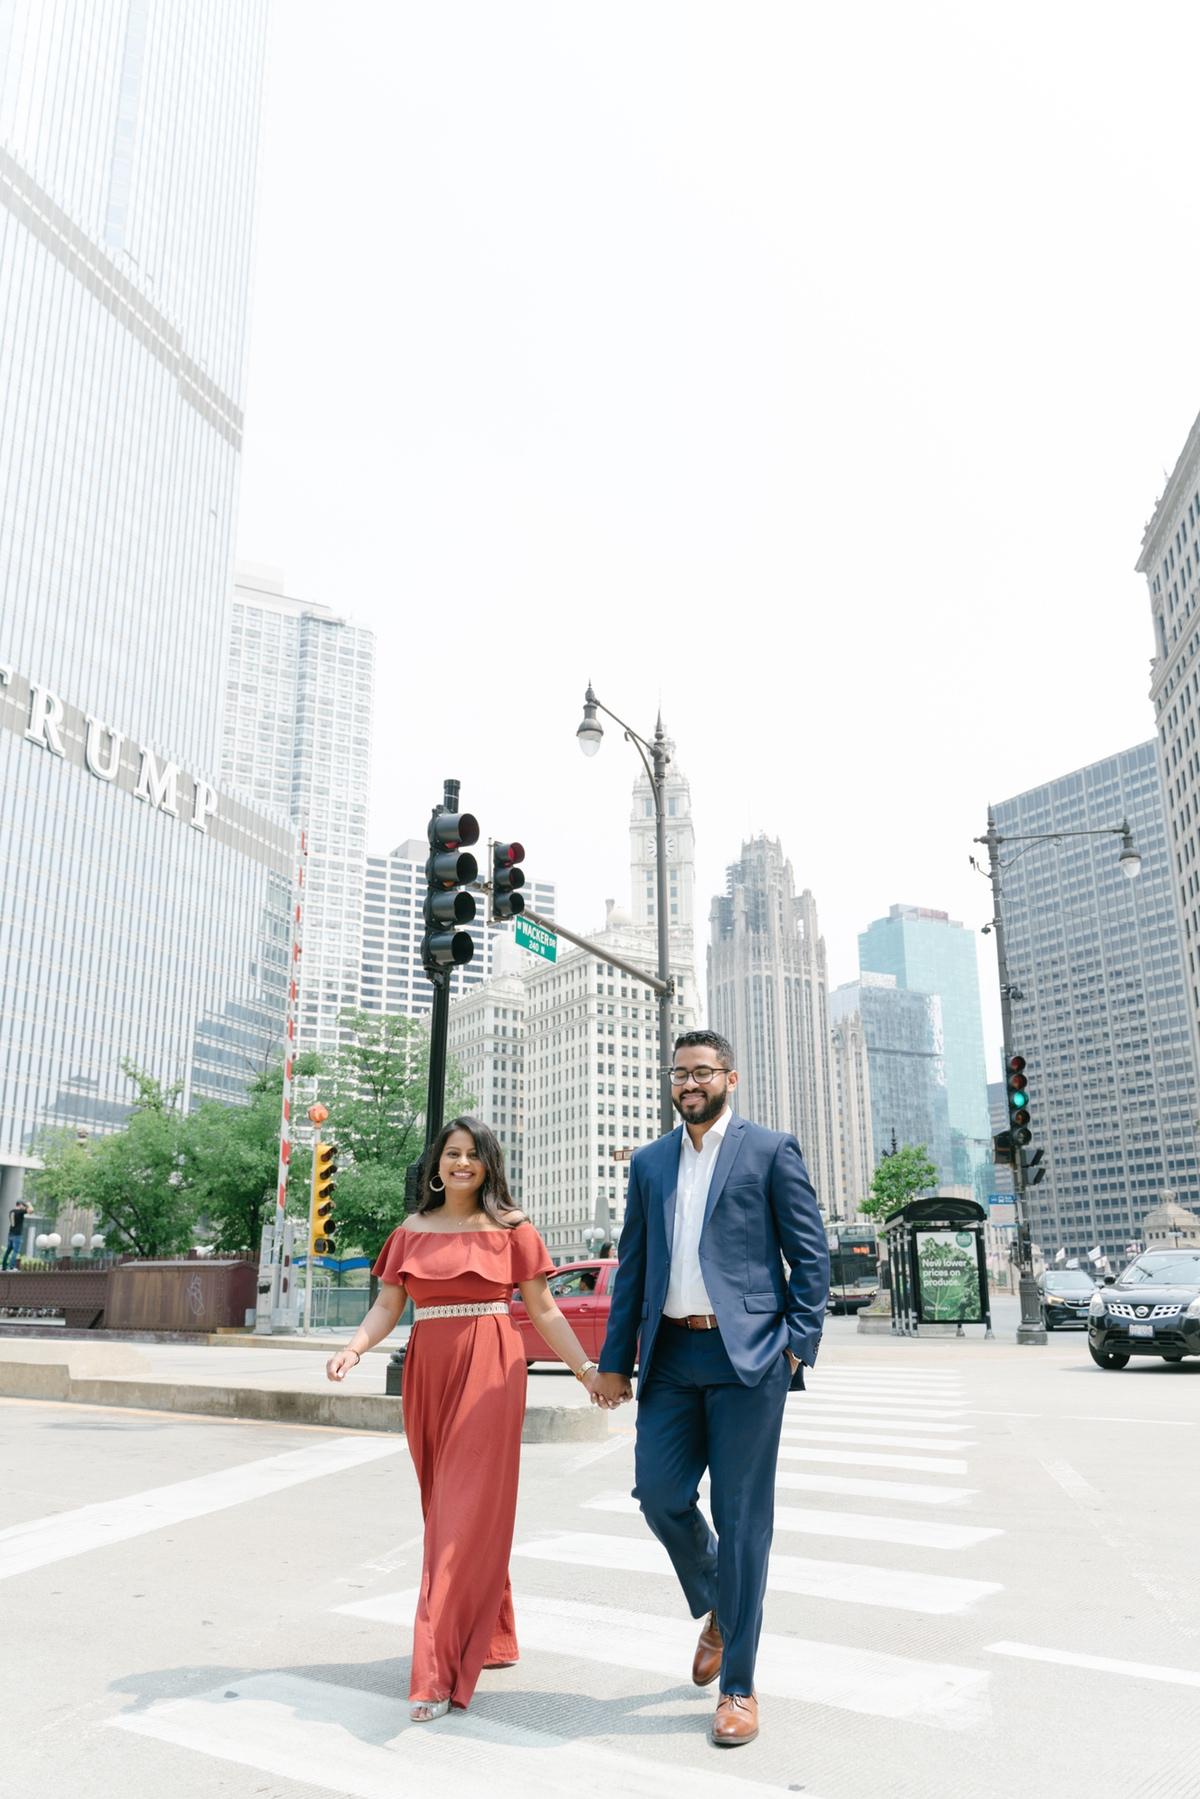 Le Cape Weddings - Sindhura - Chicago Engagement Session_-5.jpg